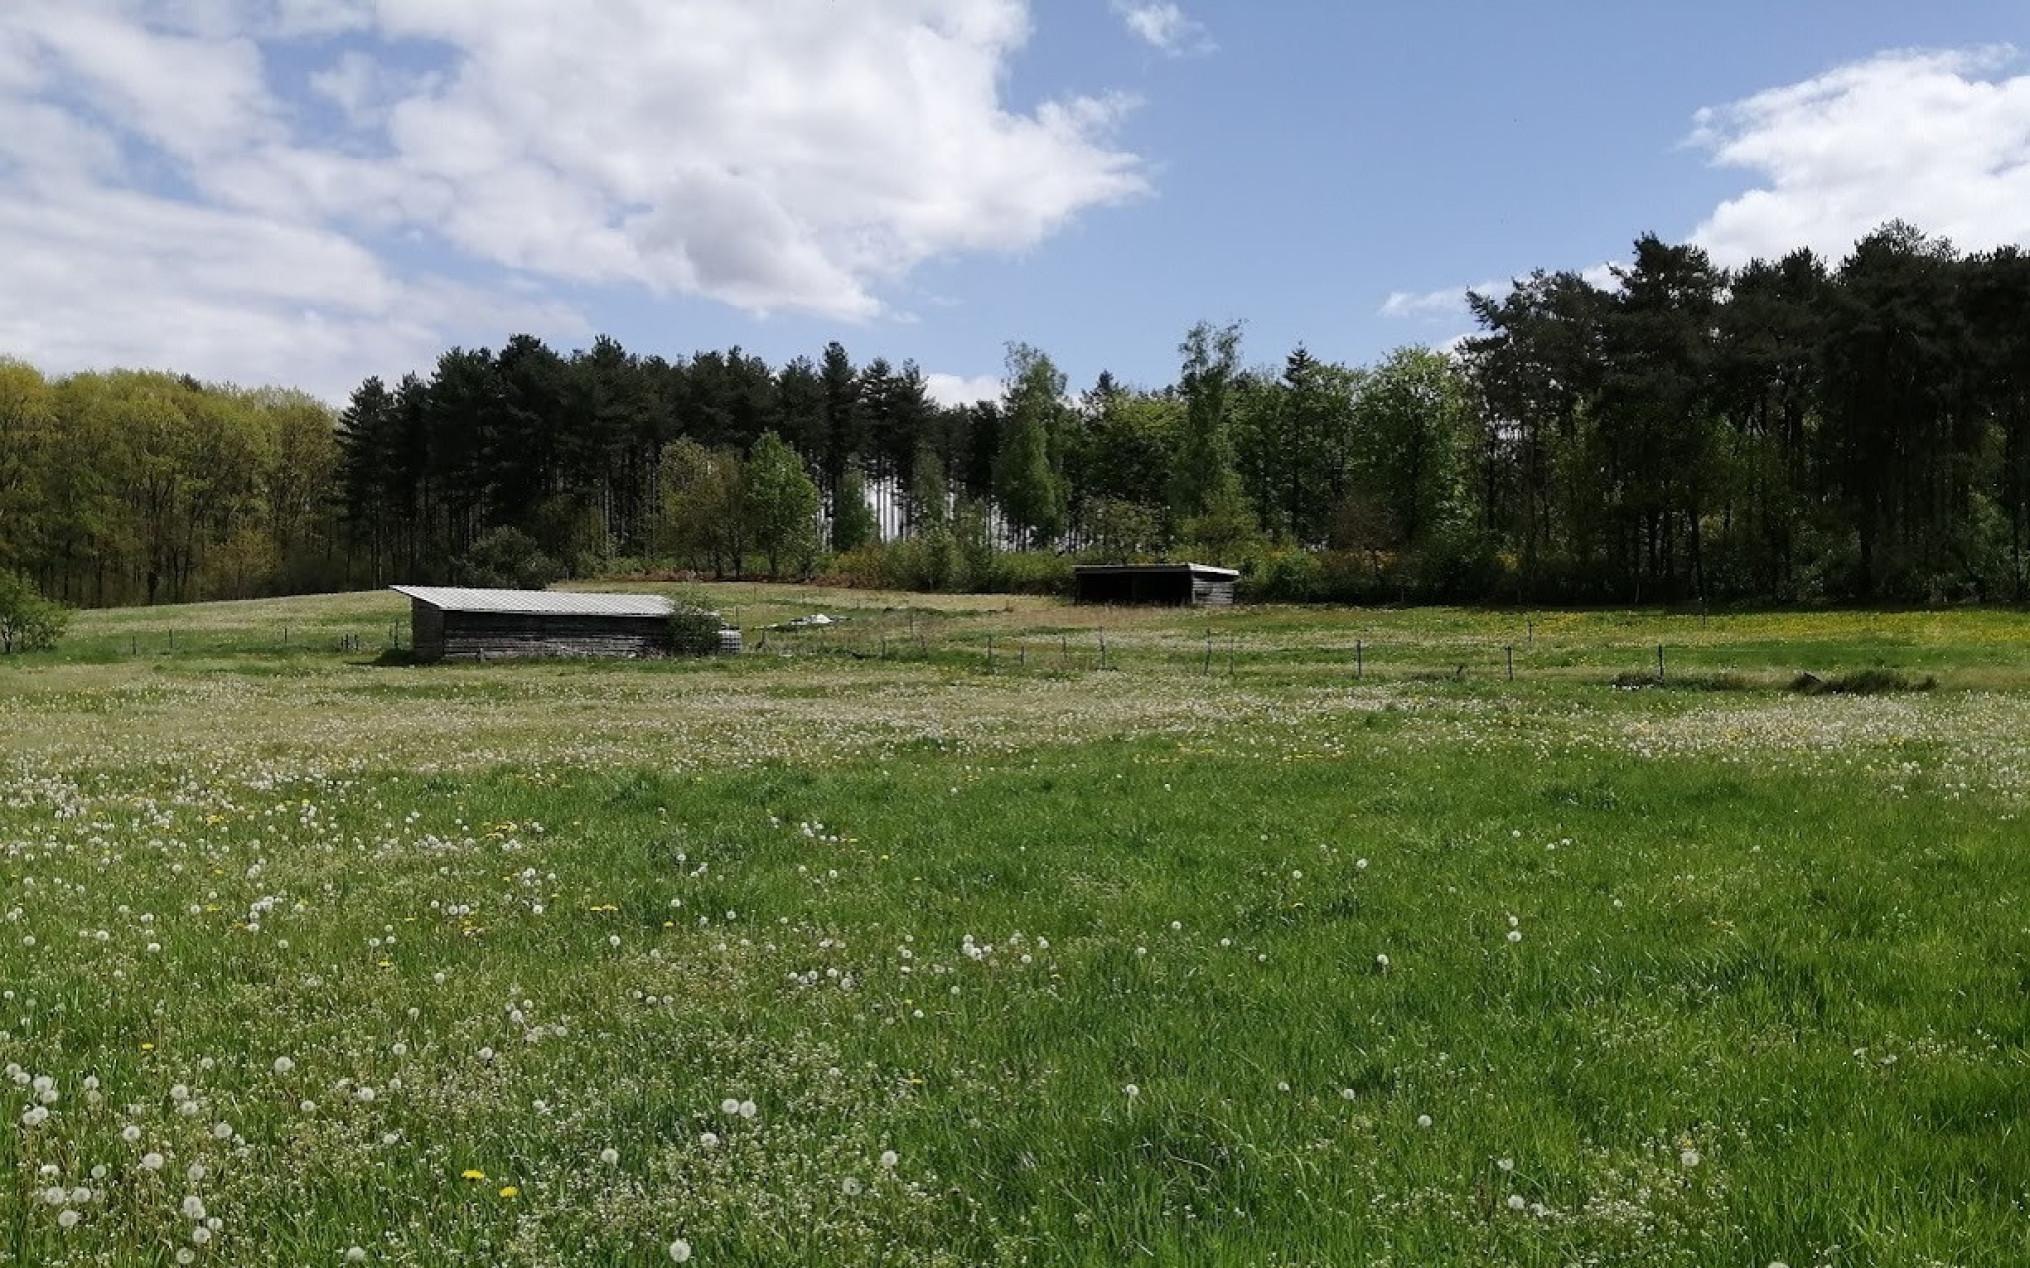 stikstof-varkensbedrijf-diest-afbraak-omgeving-natuur-1225